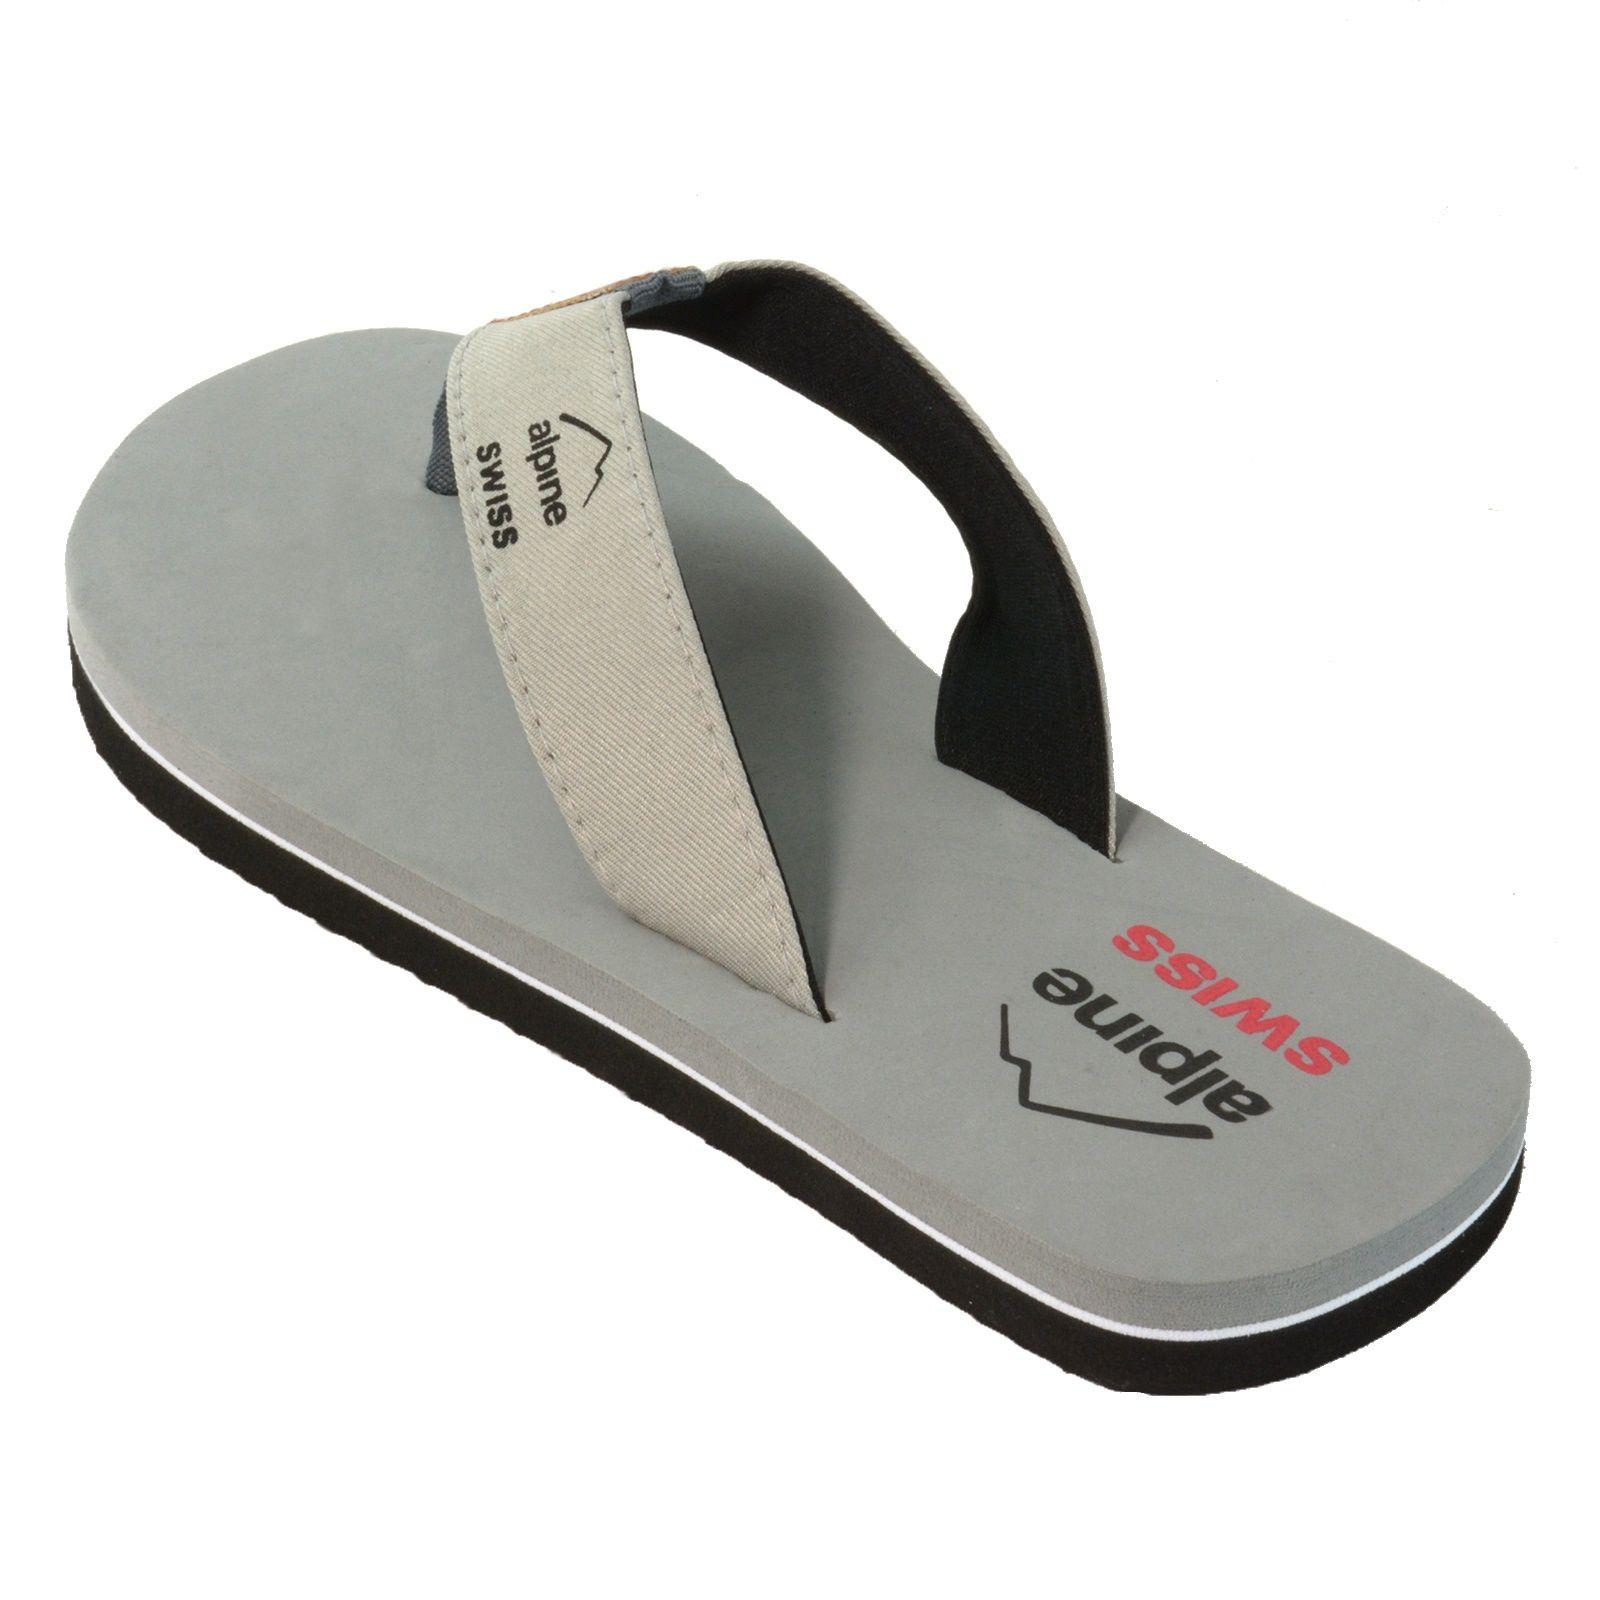 73019b719 Alpine Swiss Men s Flip Flops Beach Sandals Lightweight EVA Sole Comfort  Thongs